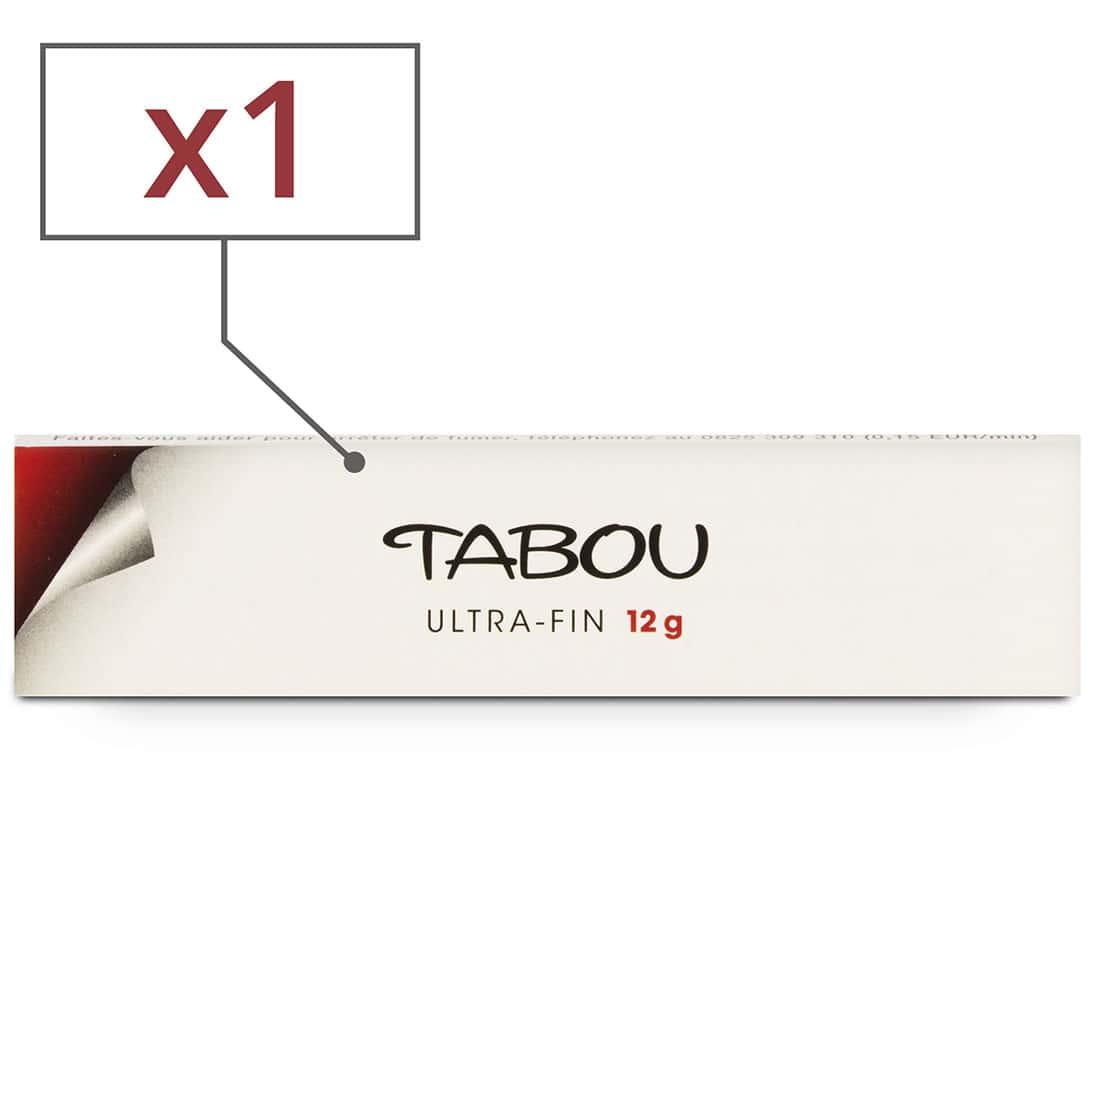 Photo de Feuille a rouler Tabou Slim Ultra Fin x 1